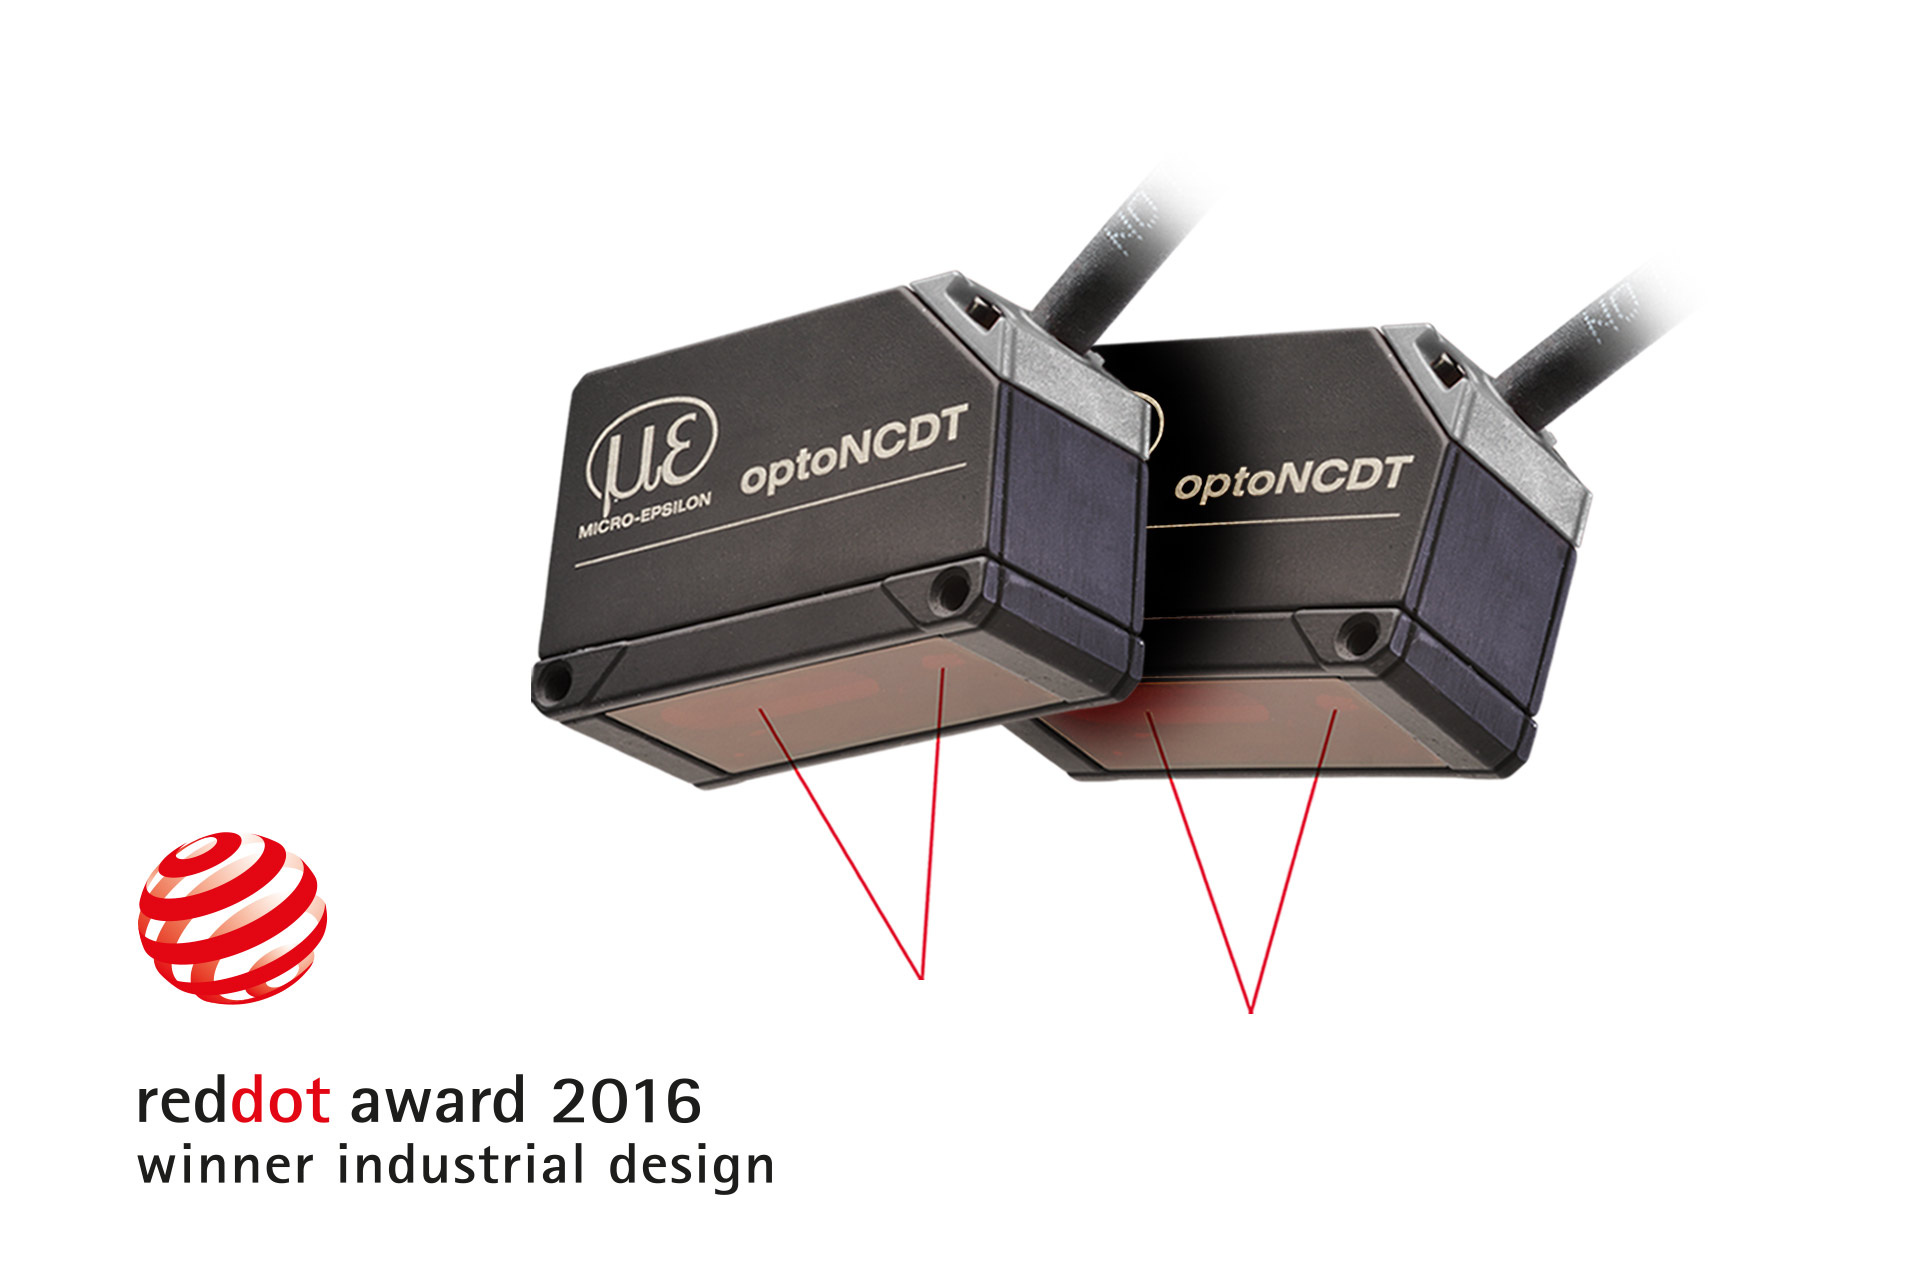 ILD1320-10 Miniatur-Laser-Wegsensor